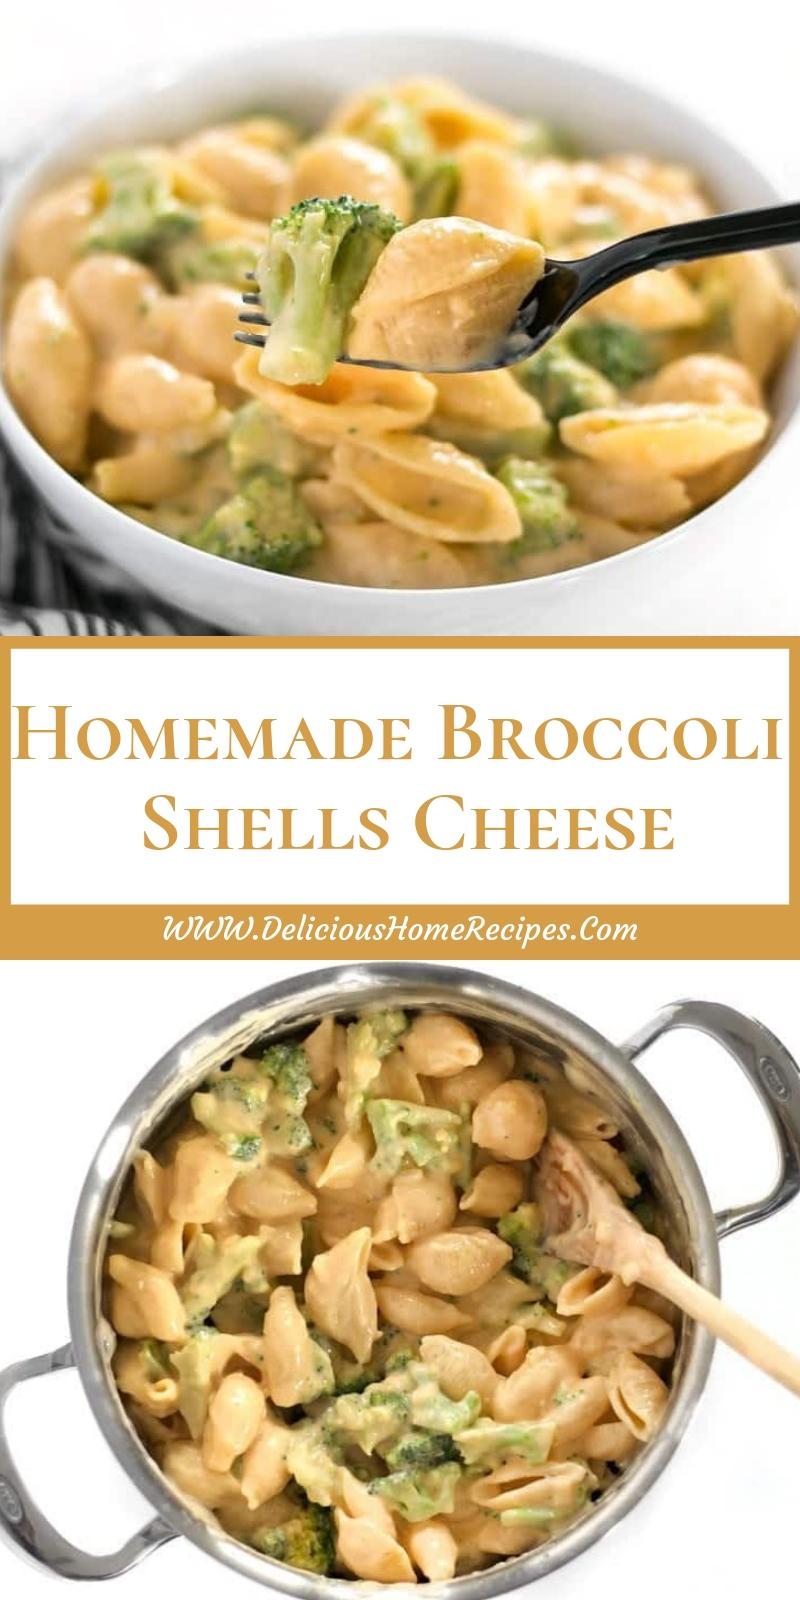 Homemade Broccoli Shells Cheese